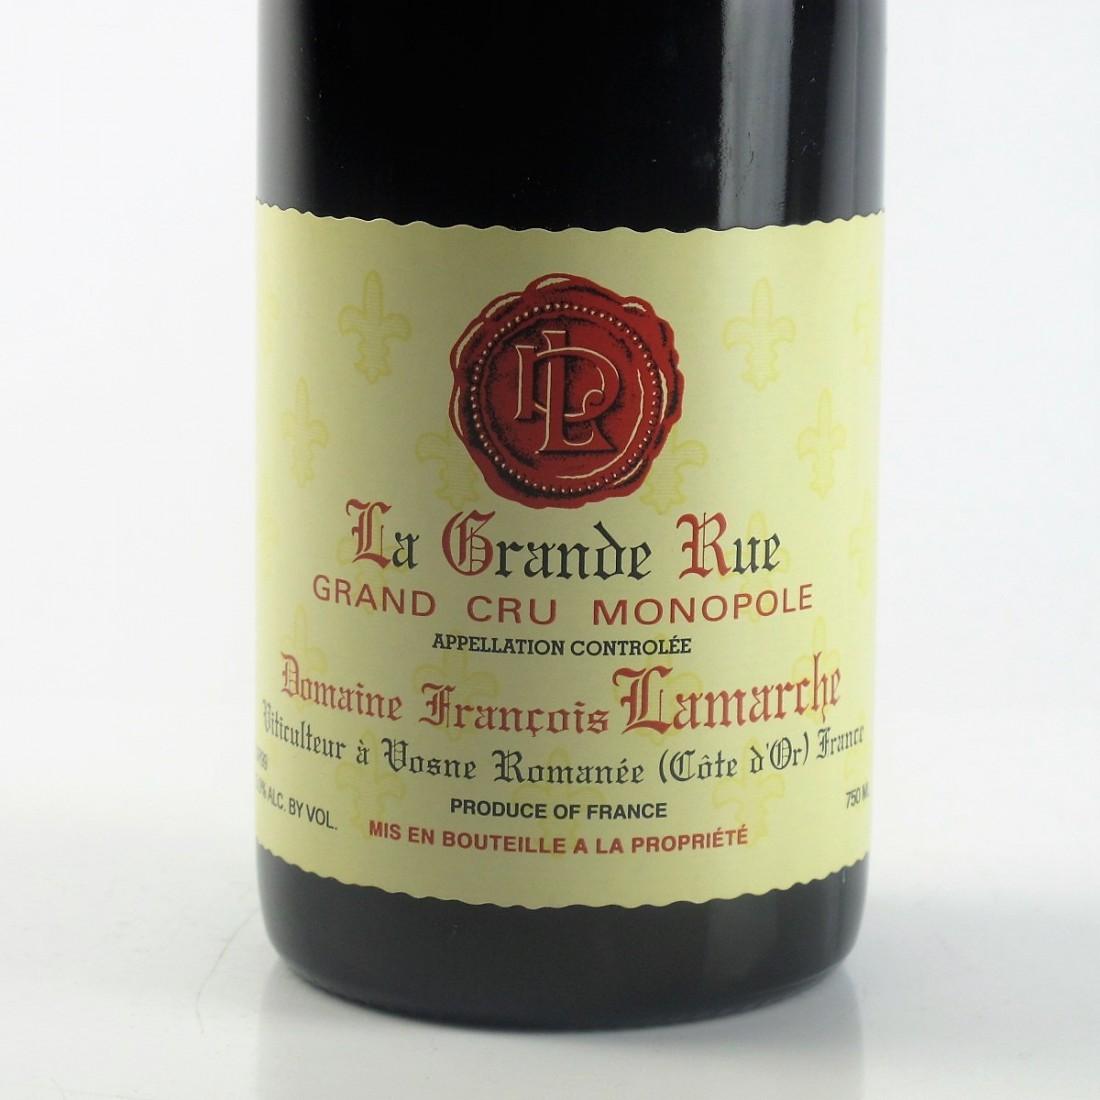 Dom. Lamarche 1999 La Grande Rue Grand-Cru